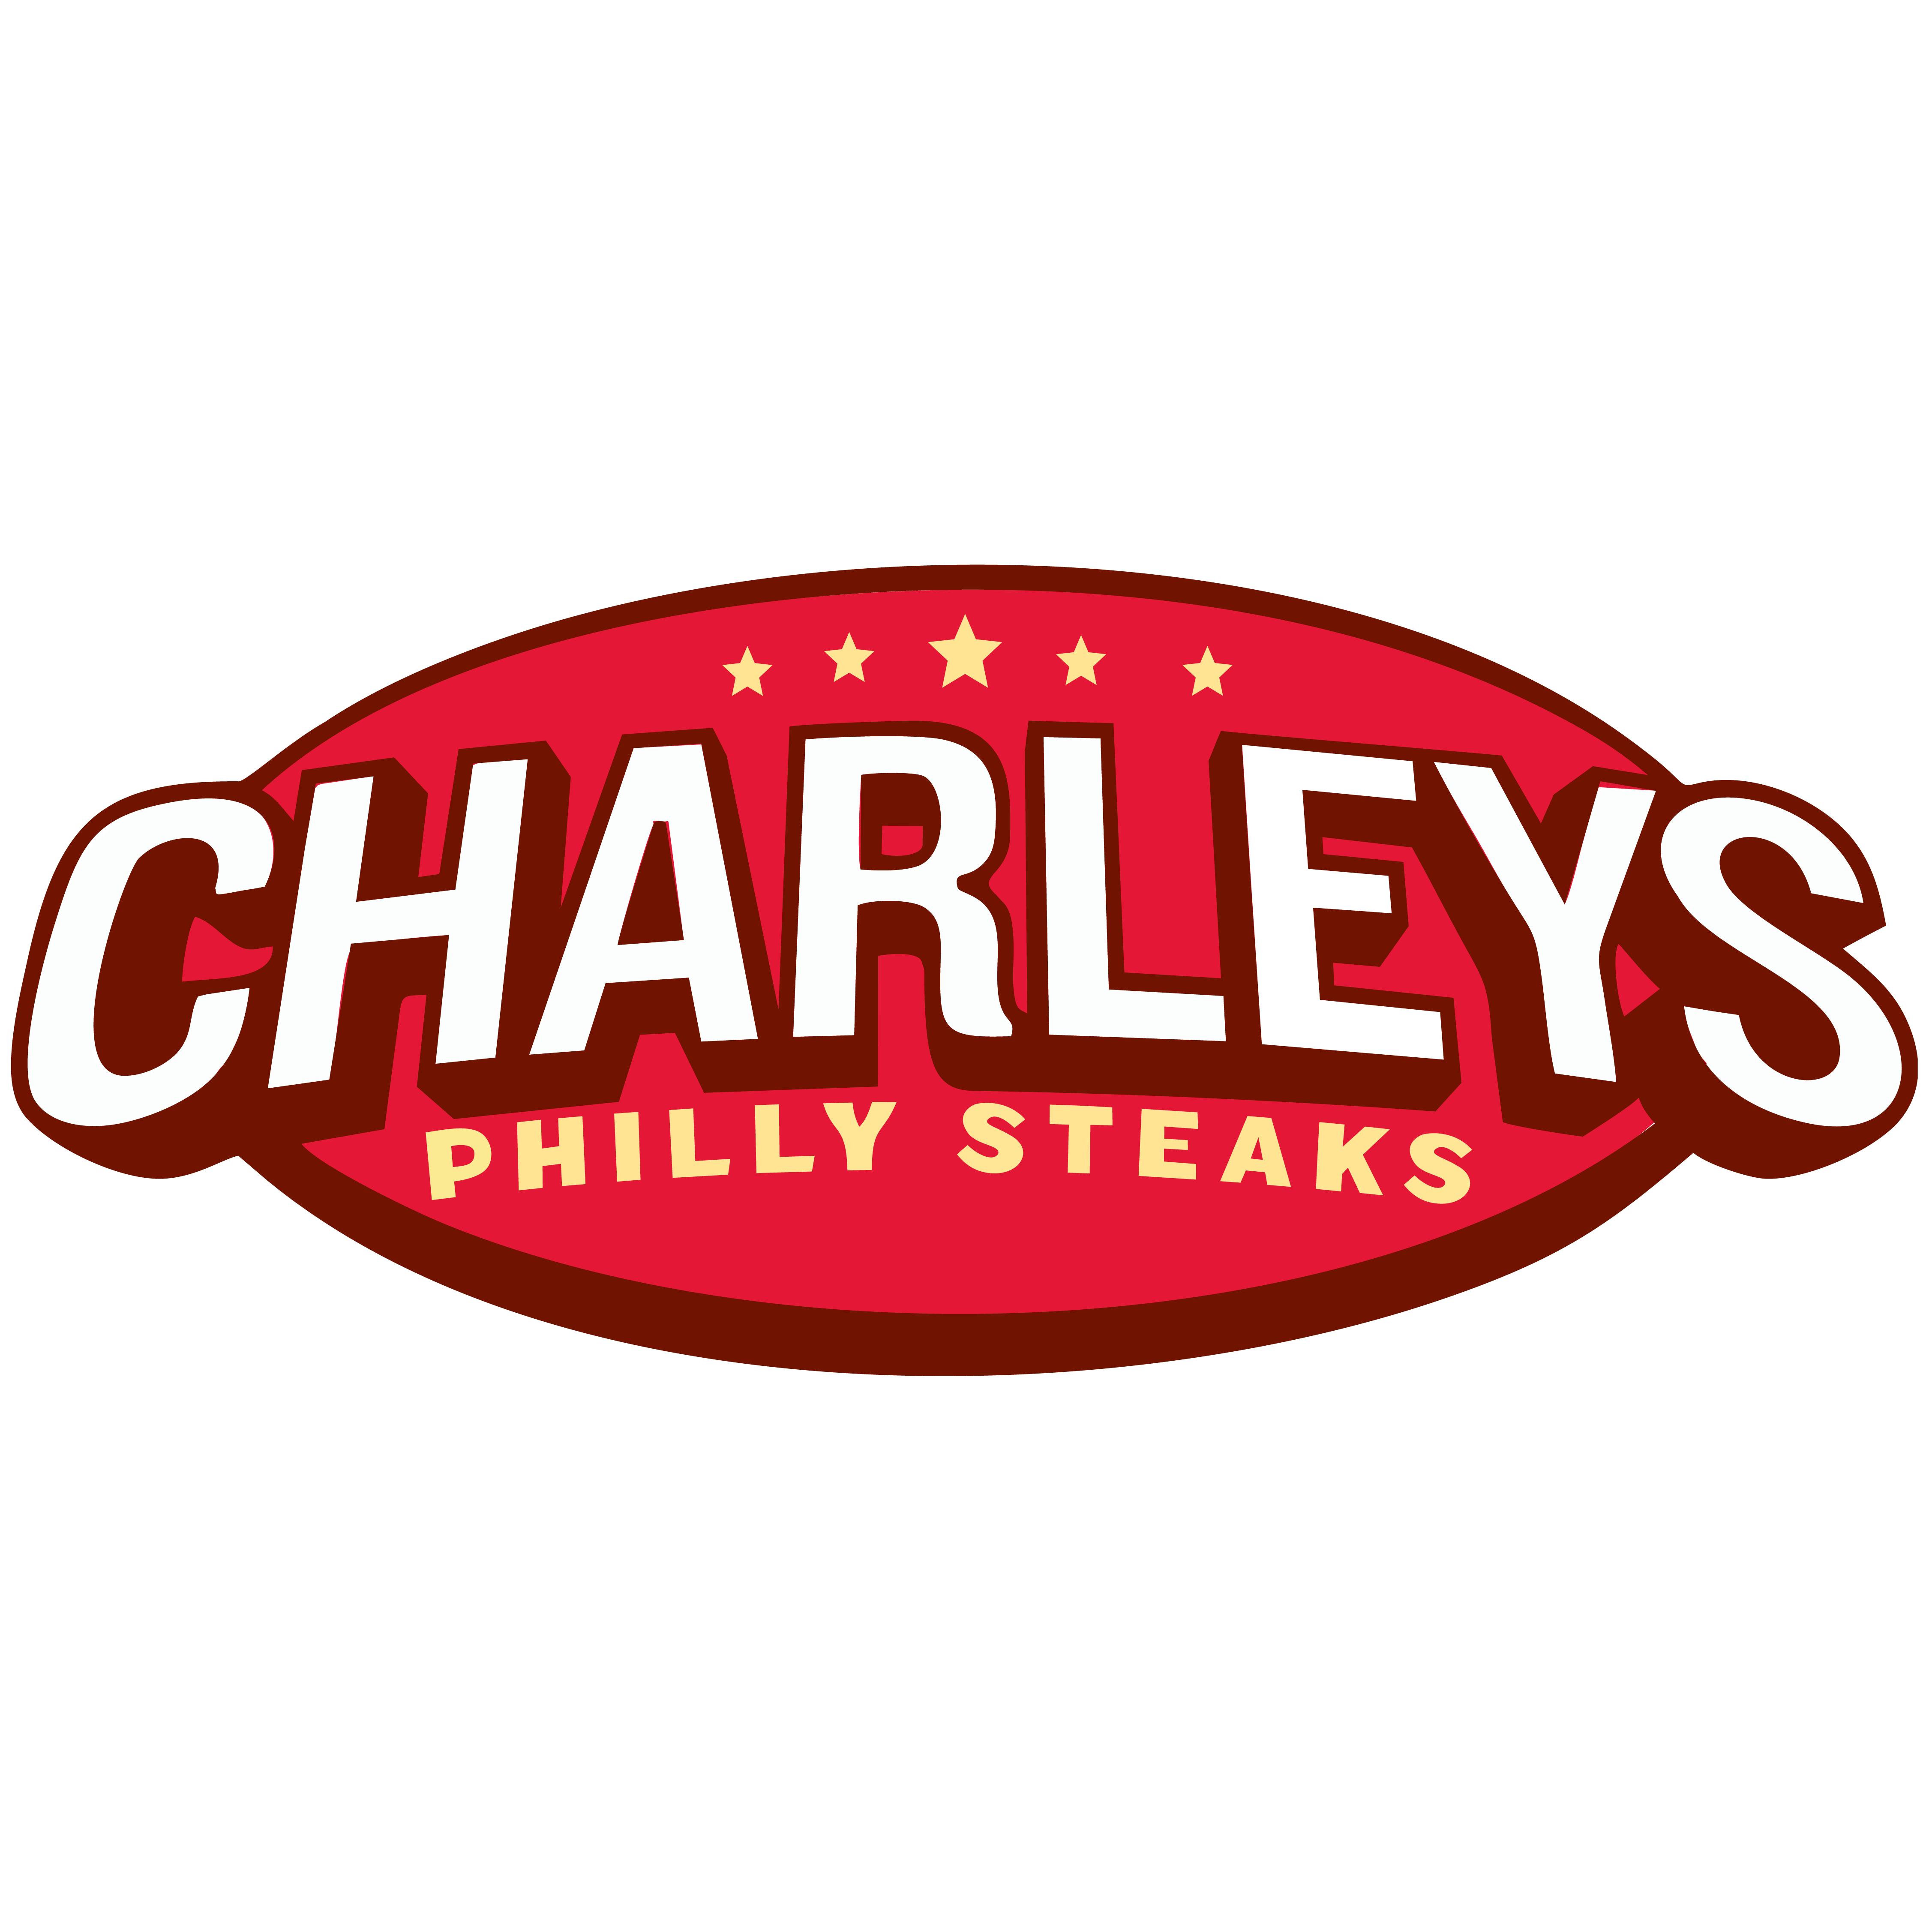 Charley's Philly Steak